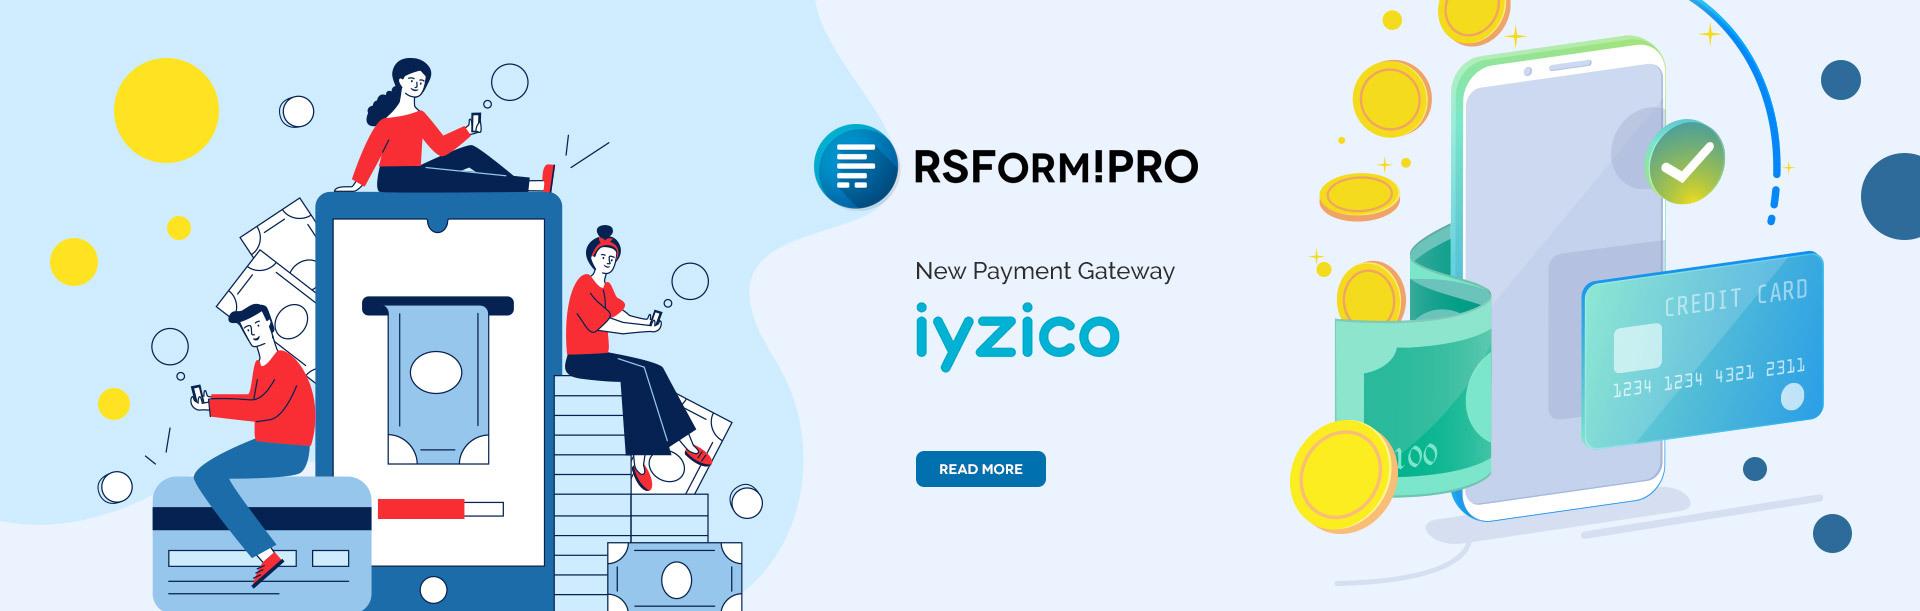 RSForm!Pro iyzico integration